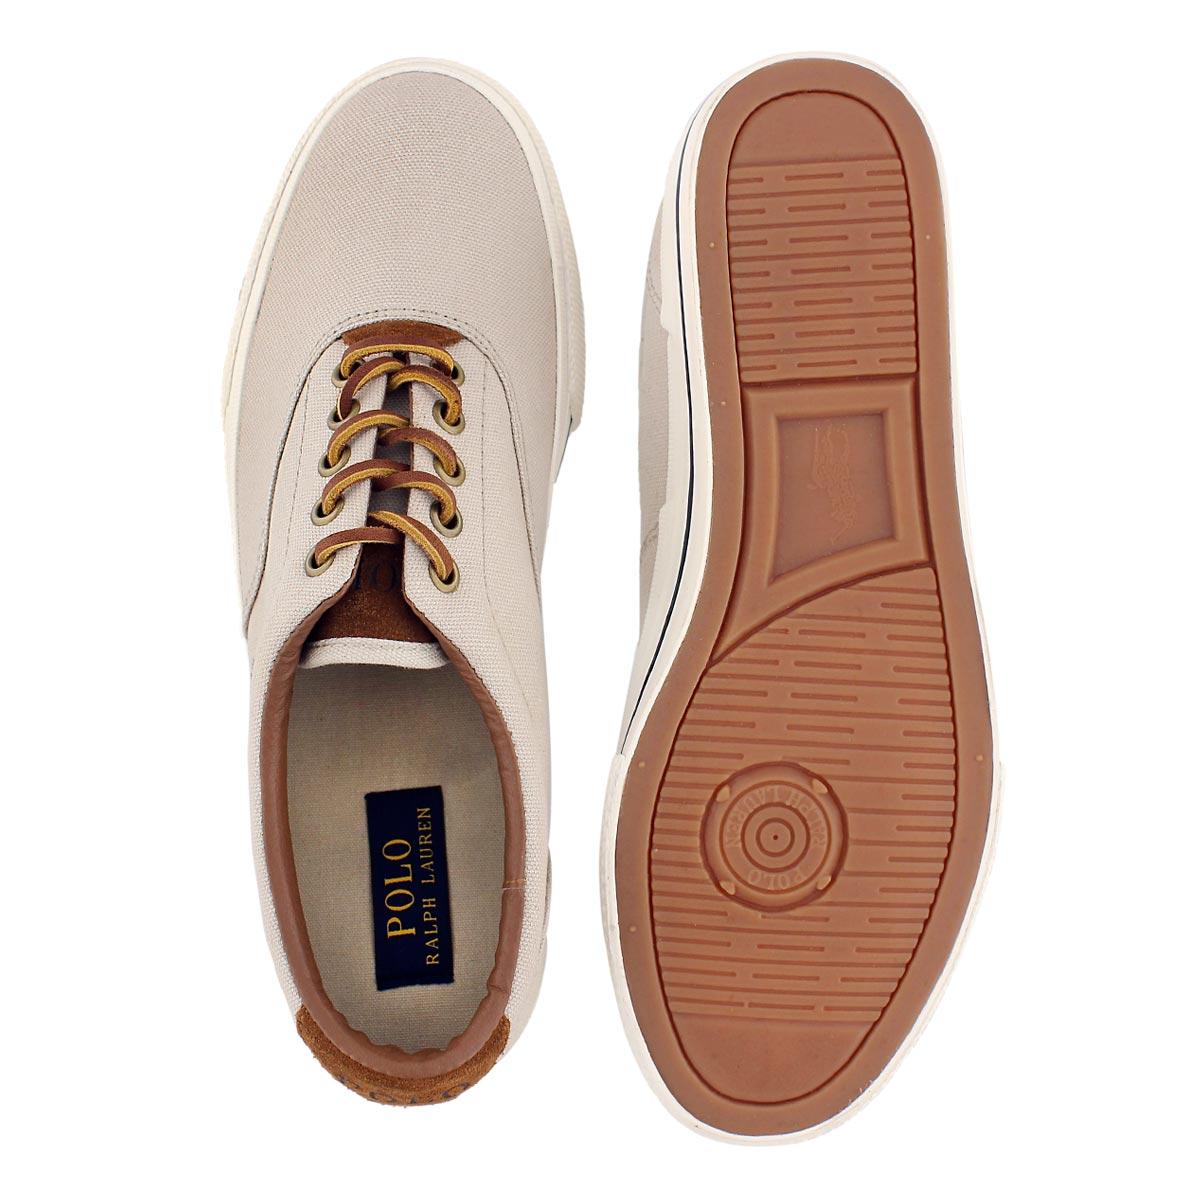 Mns Vaughn stone canvas/suede sneaker